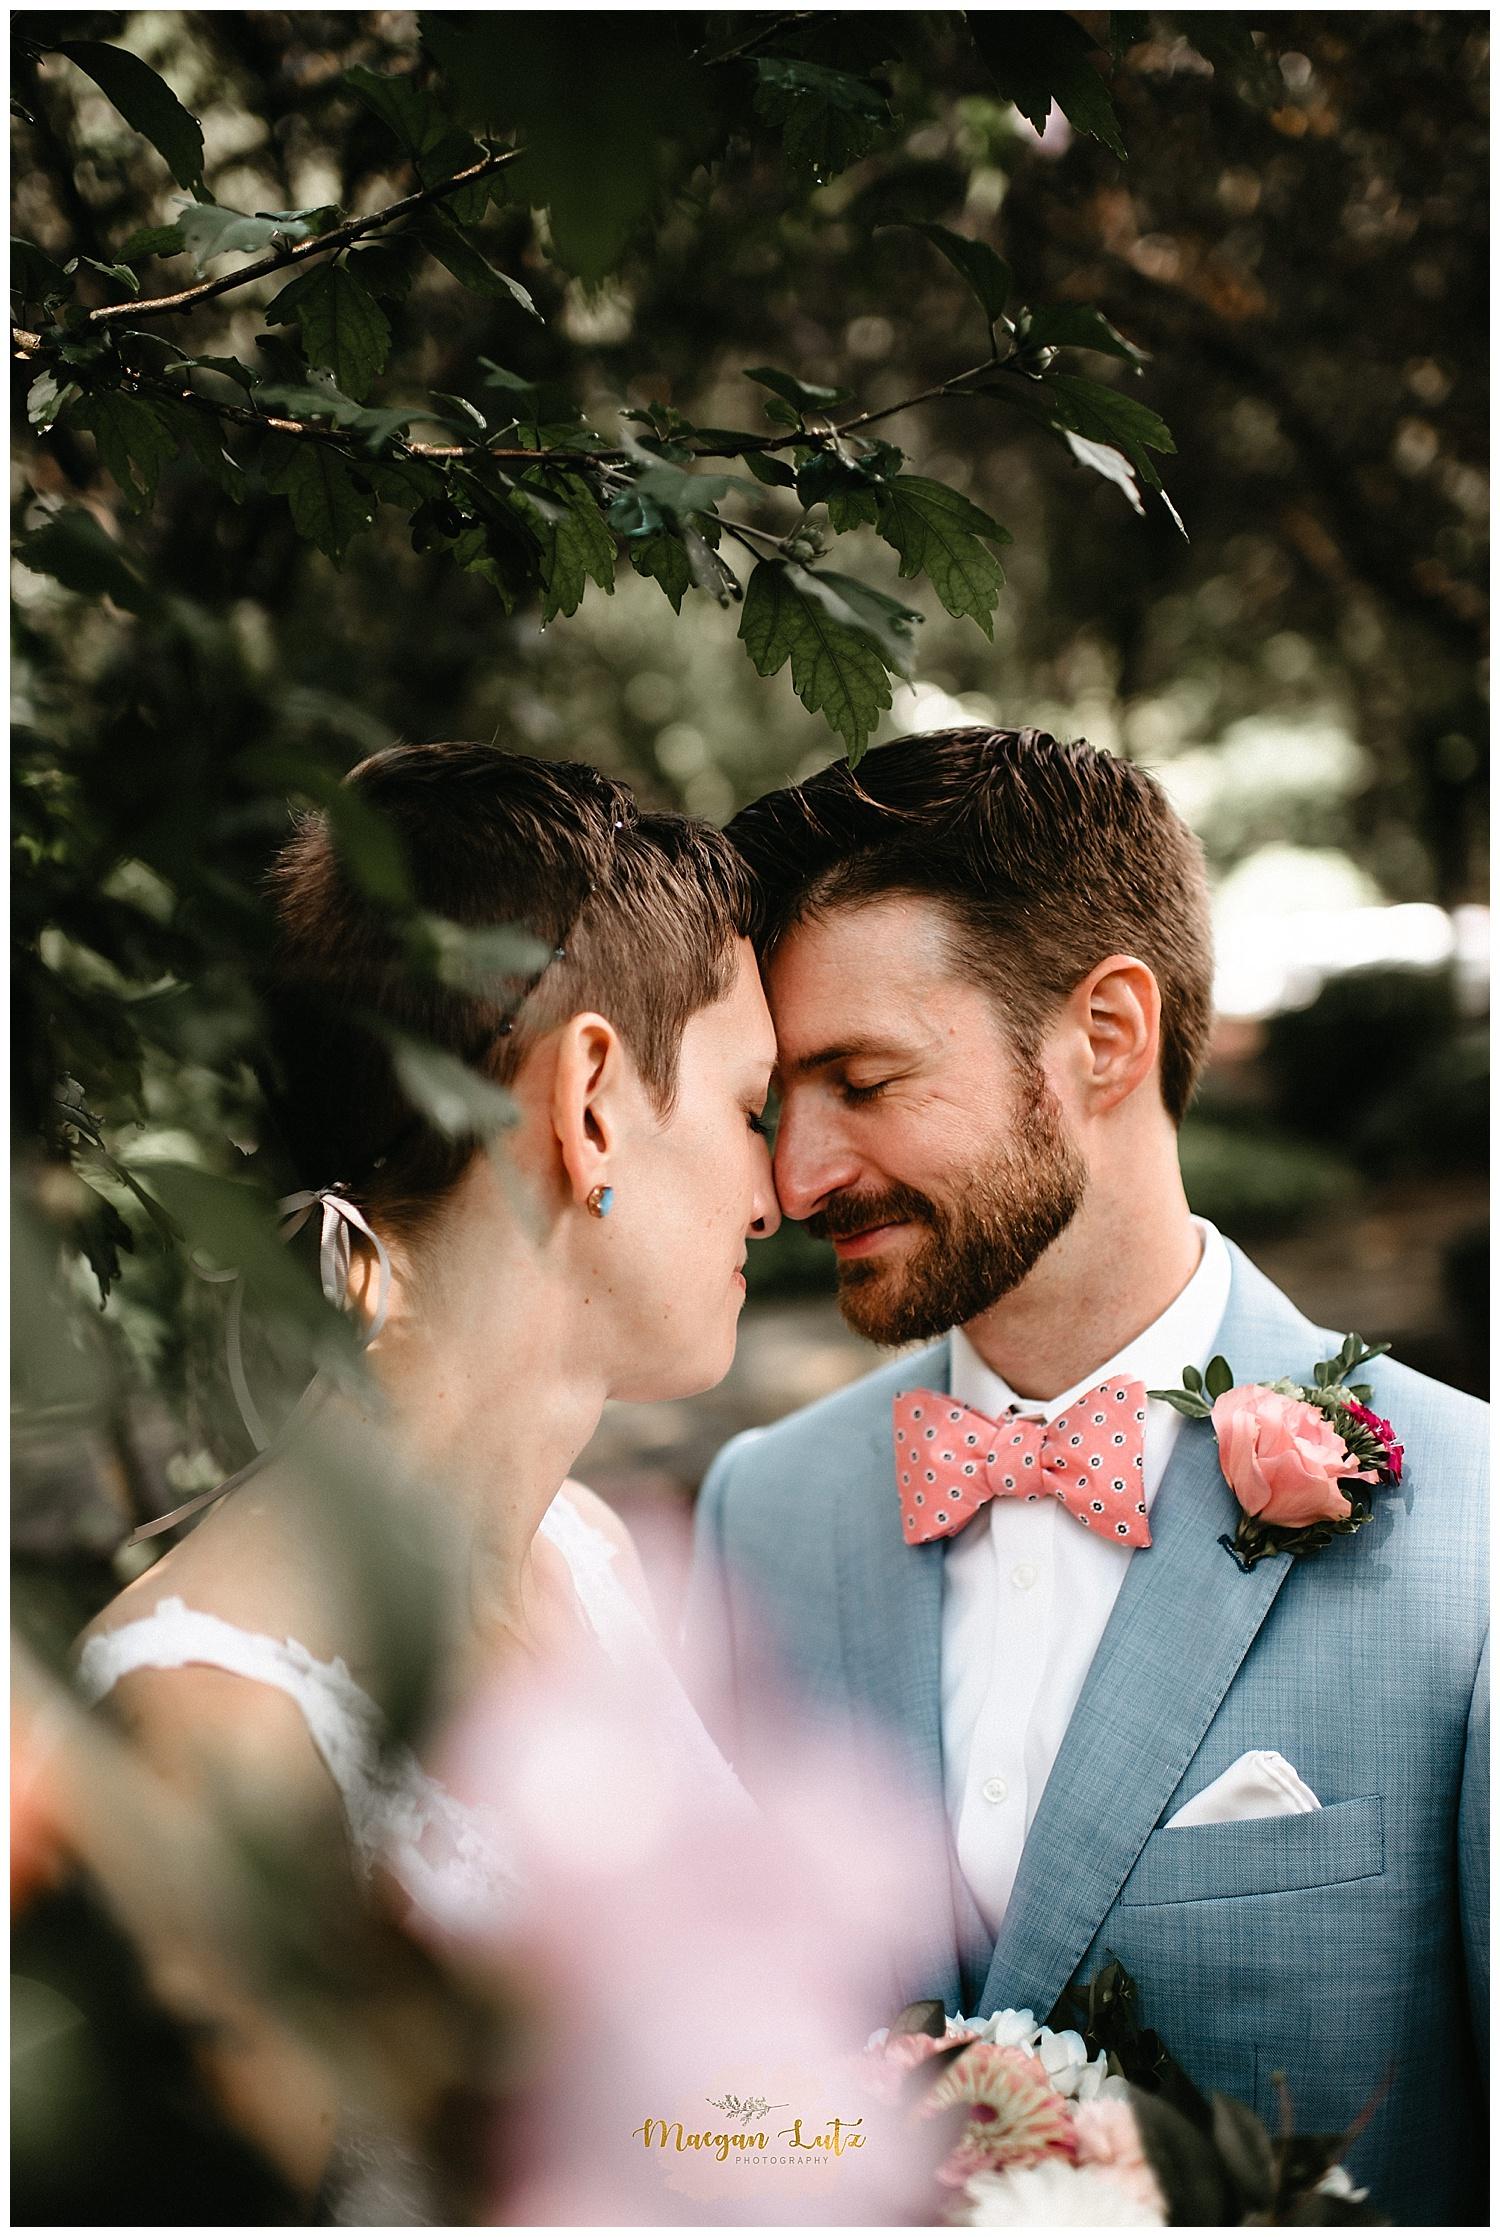 NEPA-Wedding-Photographer-at-Carmens-Country-Inn-and-Gardens-Drums-PA_0006.jpg